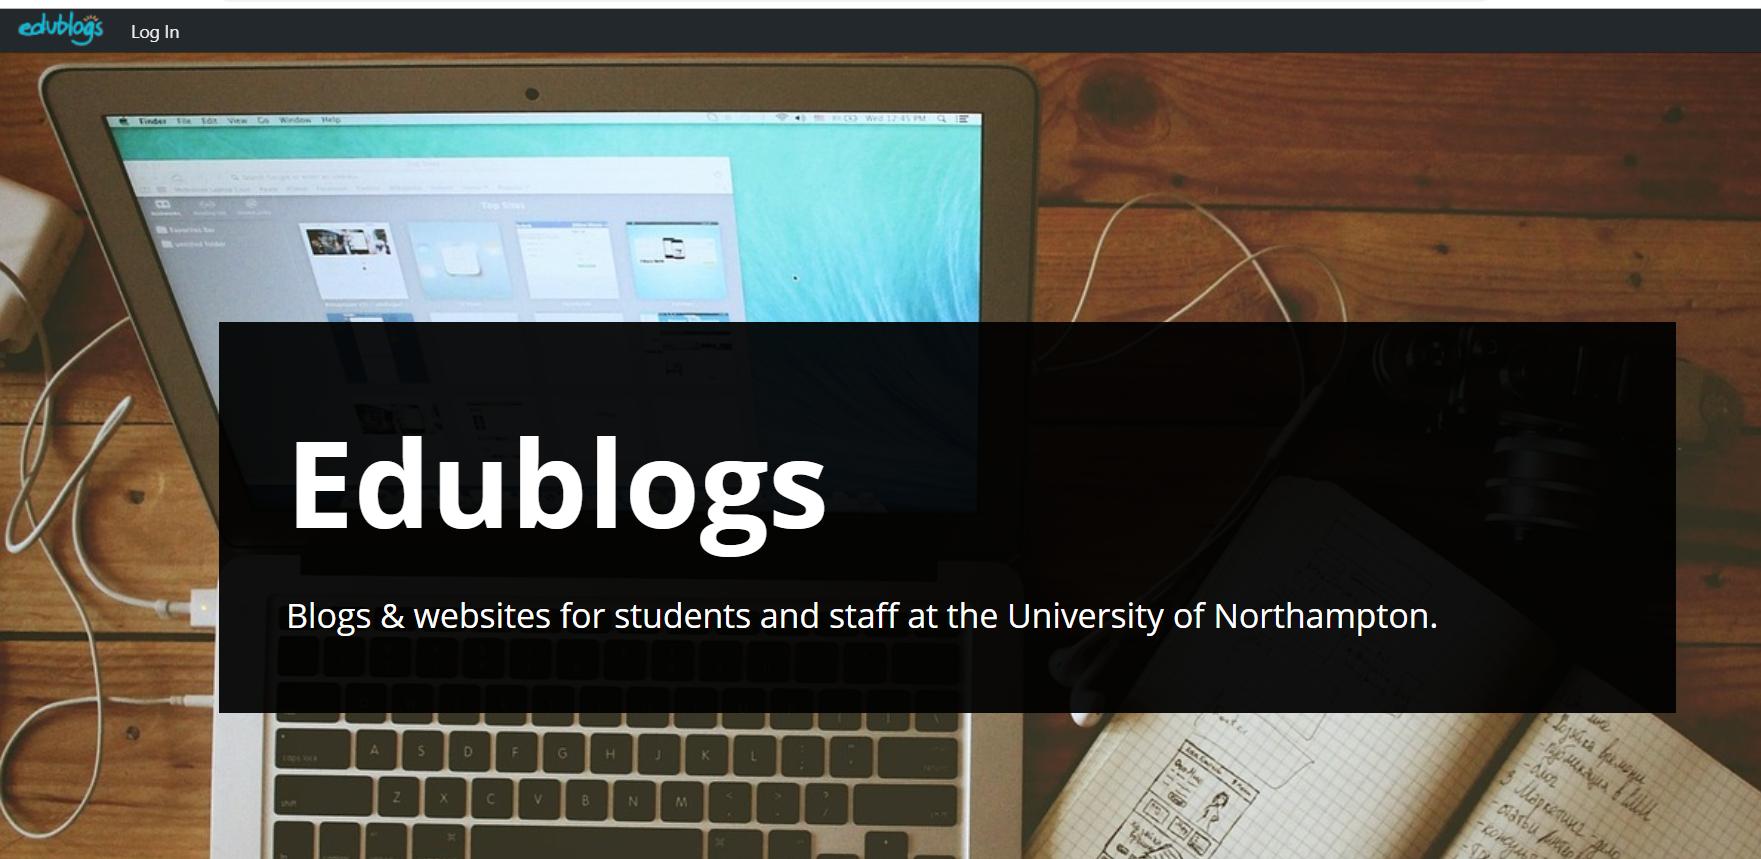 edublogs home screen